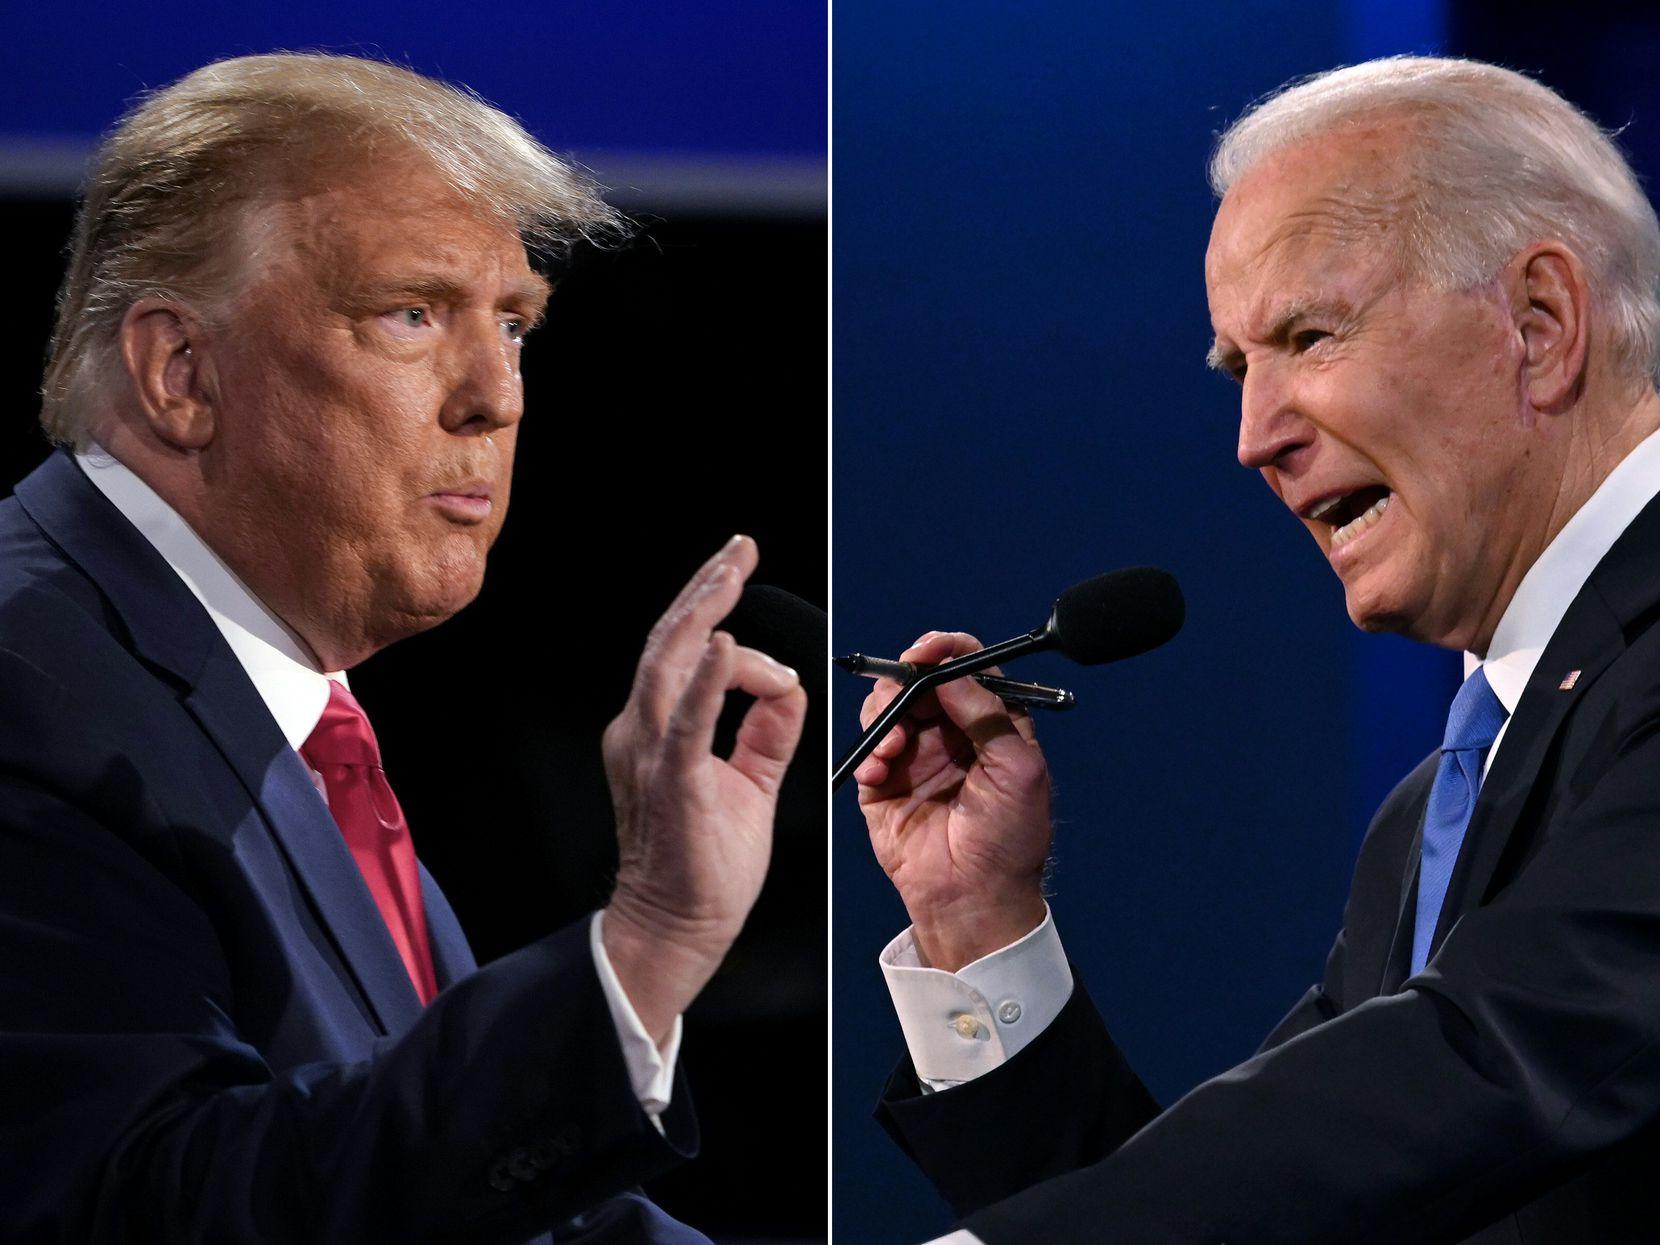 President Donald Trump and former Vice President Joe Biden debate at Belmont University in Nashville, Tennessee, on October 22, 2020.